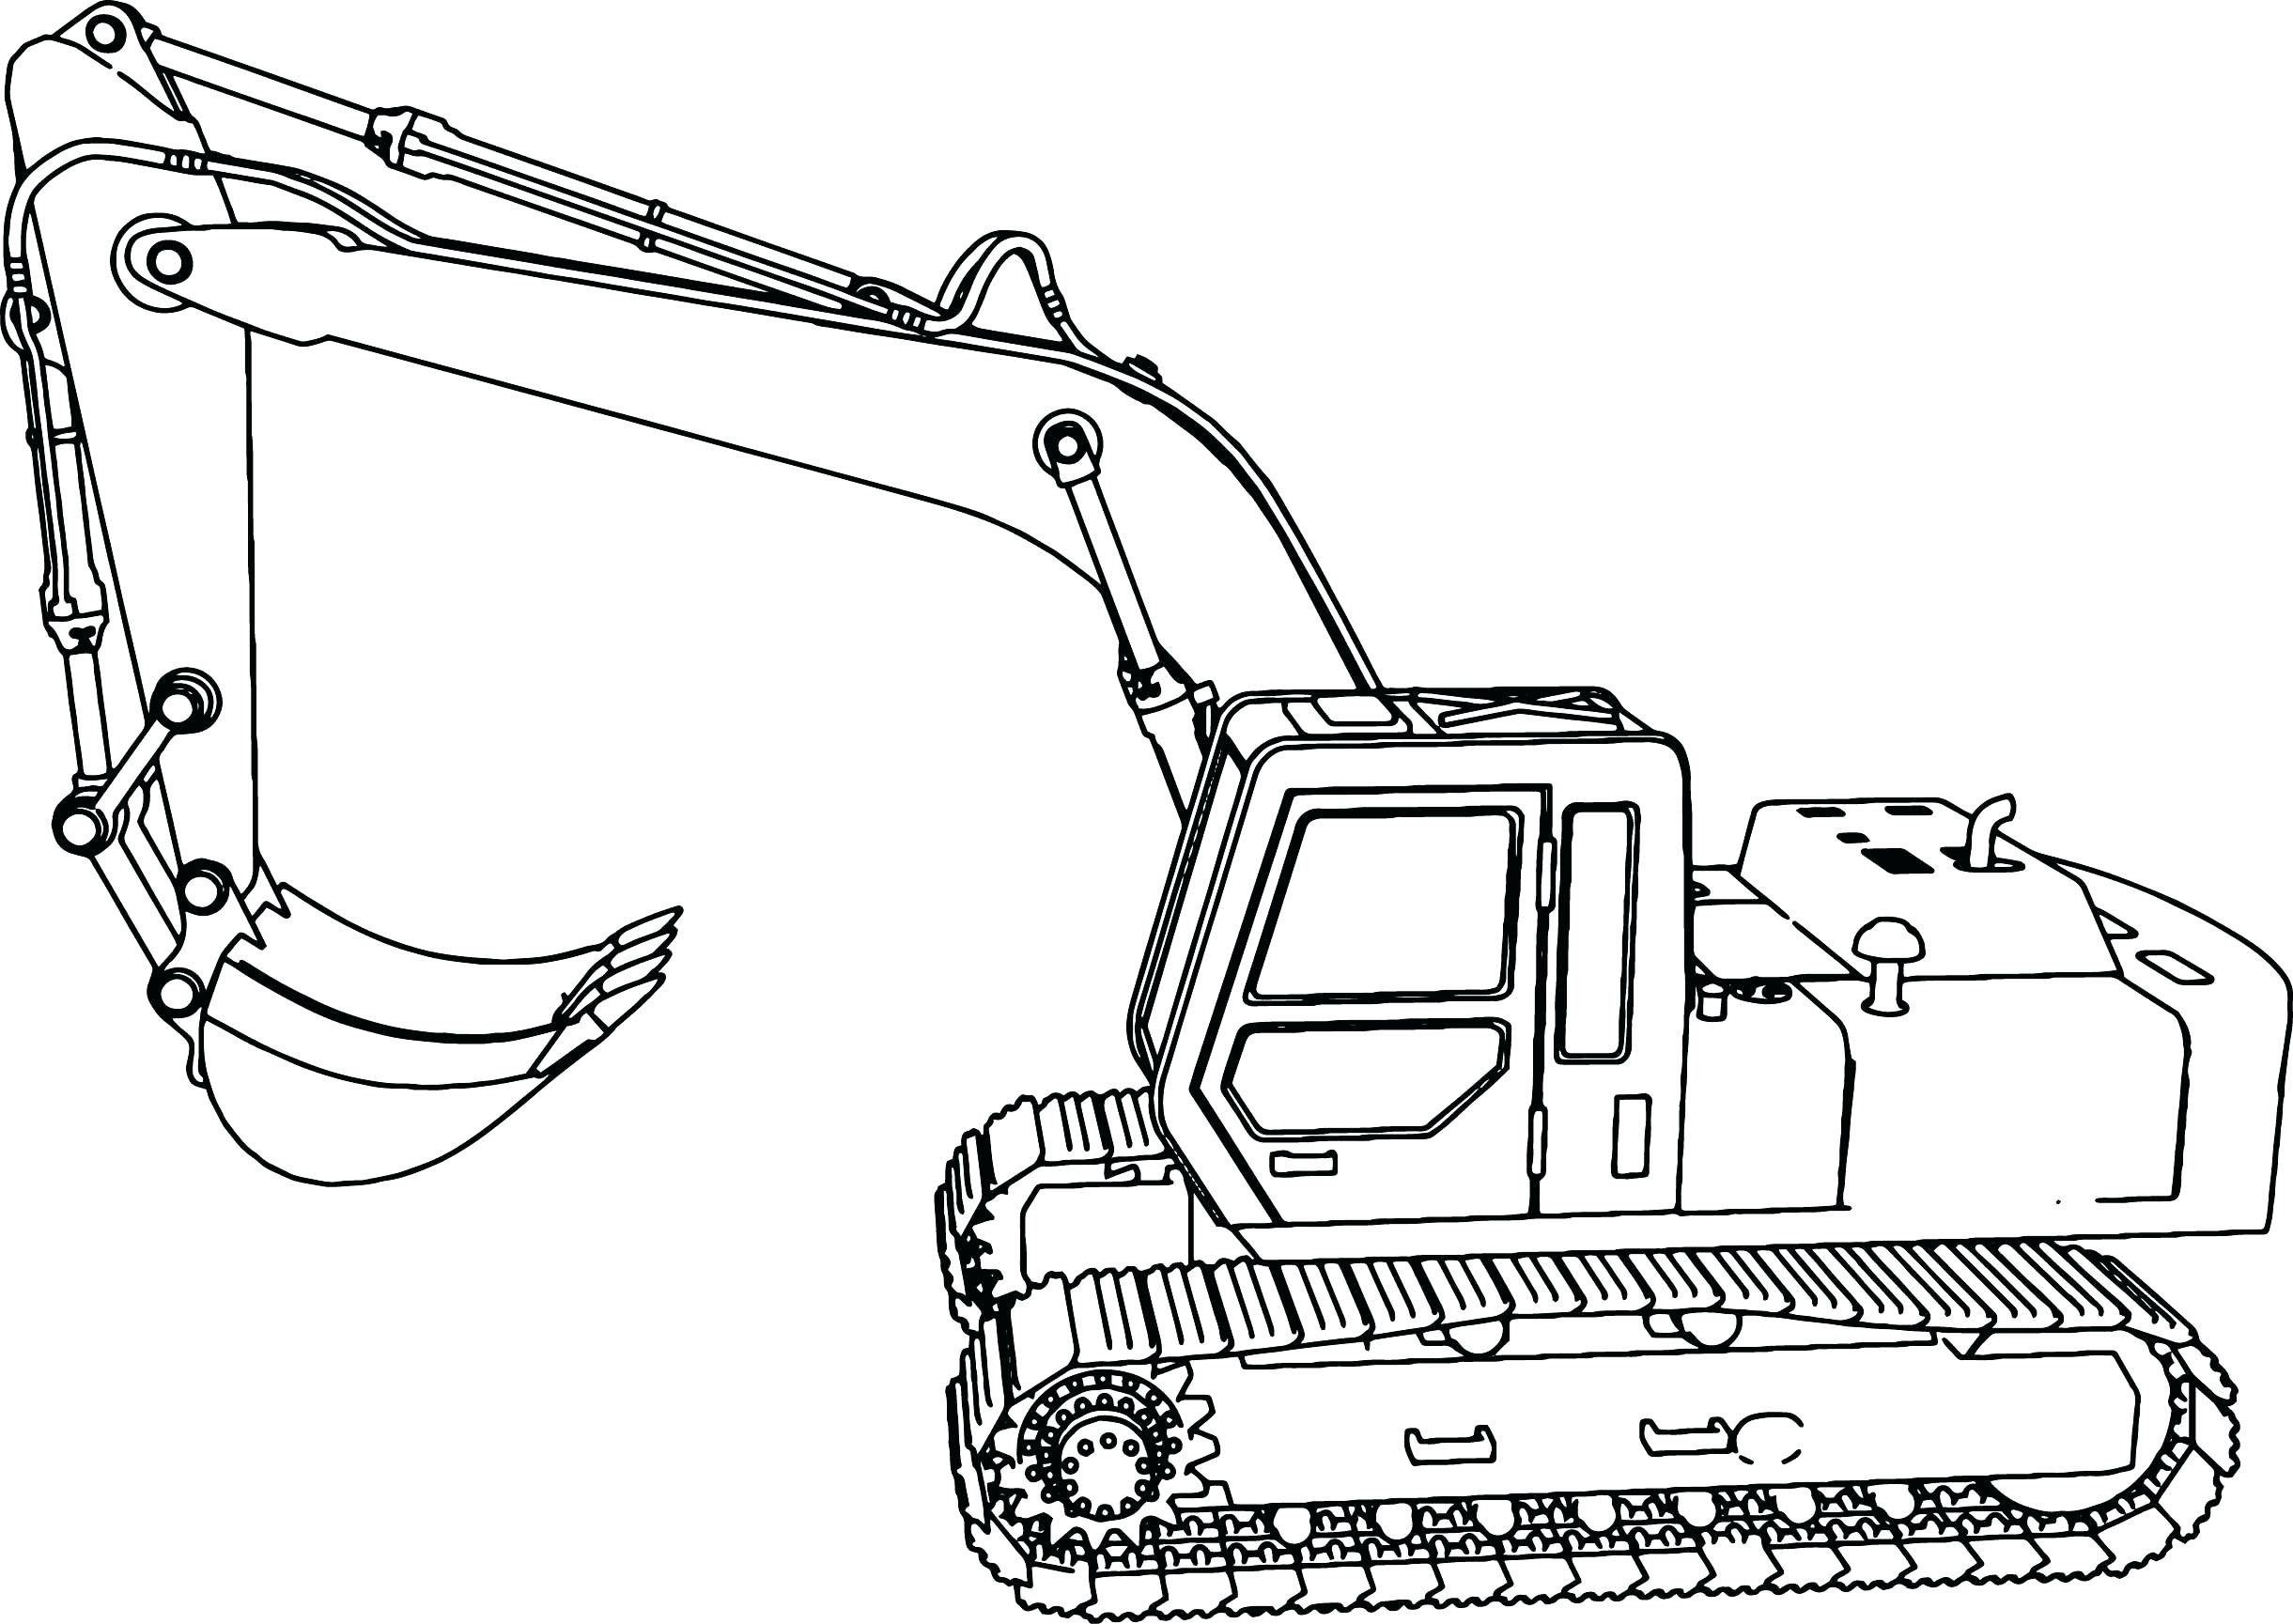 Focus Excavator Coloring Page John Deere Pages